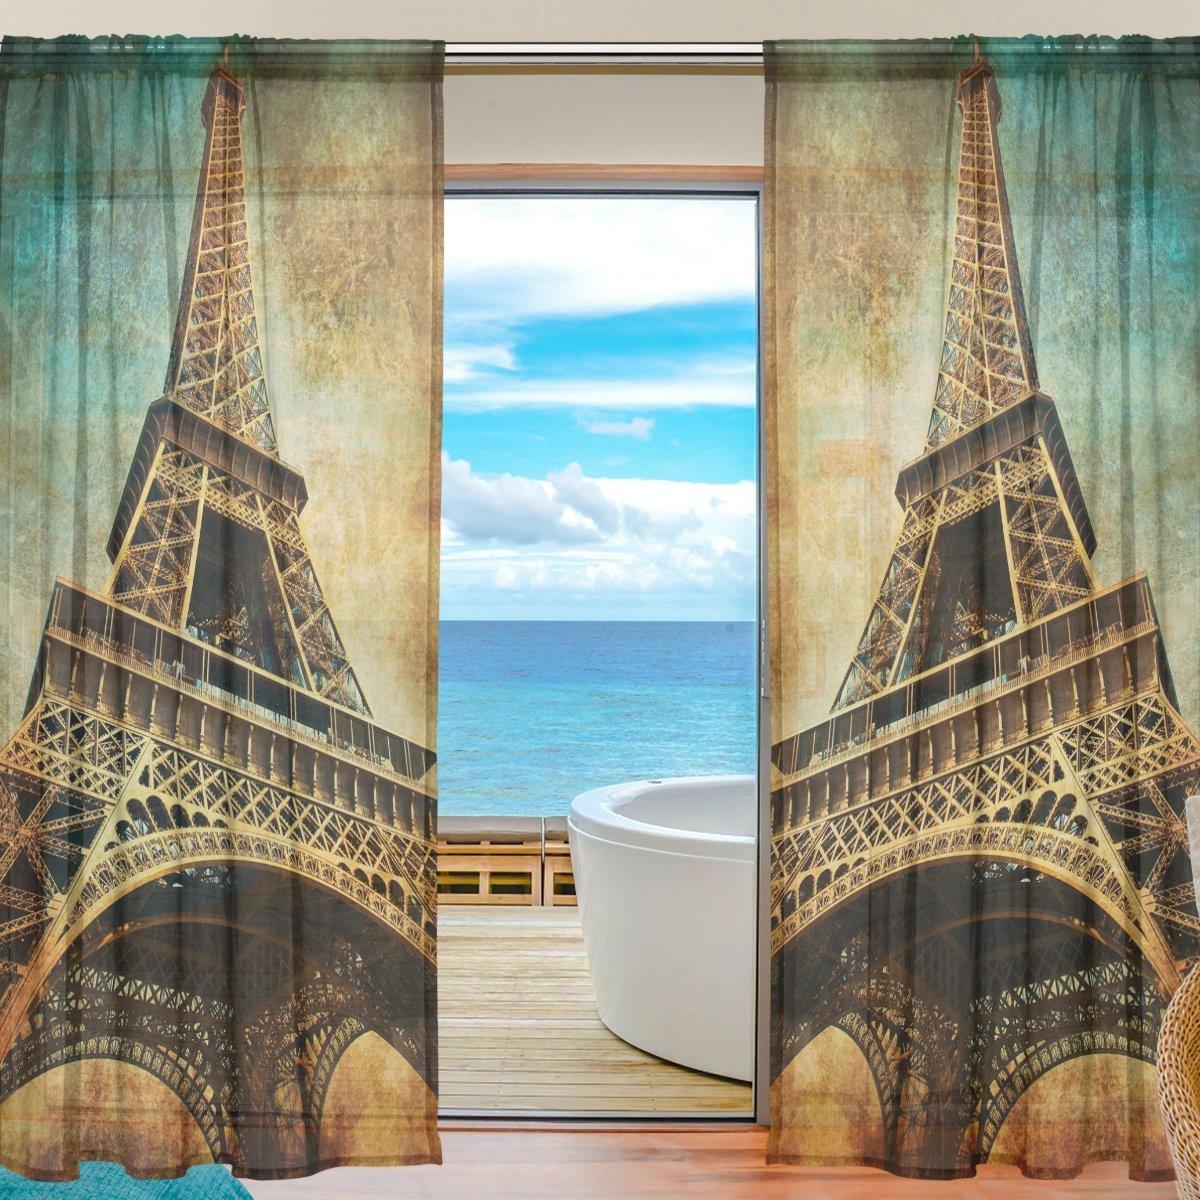 seulifeウィンドウ薄手のカーテン、ヴィンテージパリエッフェル塔ボイルカーテンドレープドアキッチンリビングルームベッドルーム55 x 55\ 78インチ2パネル 55